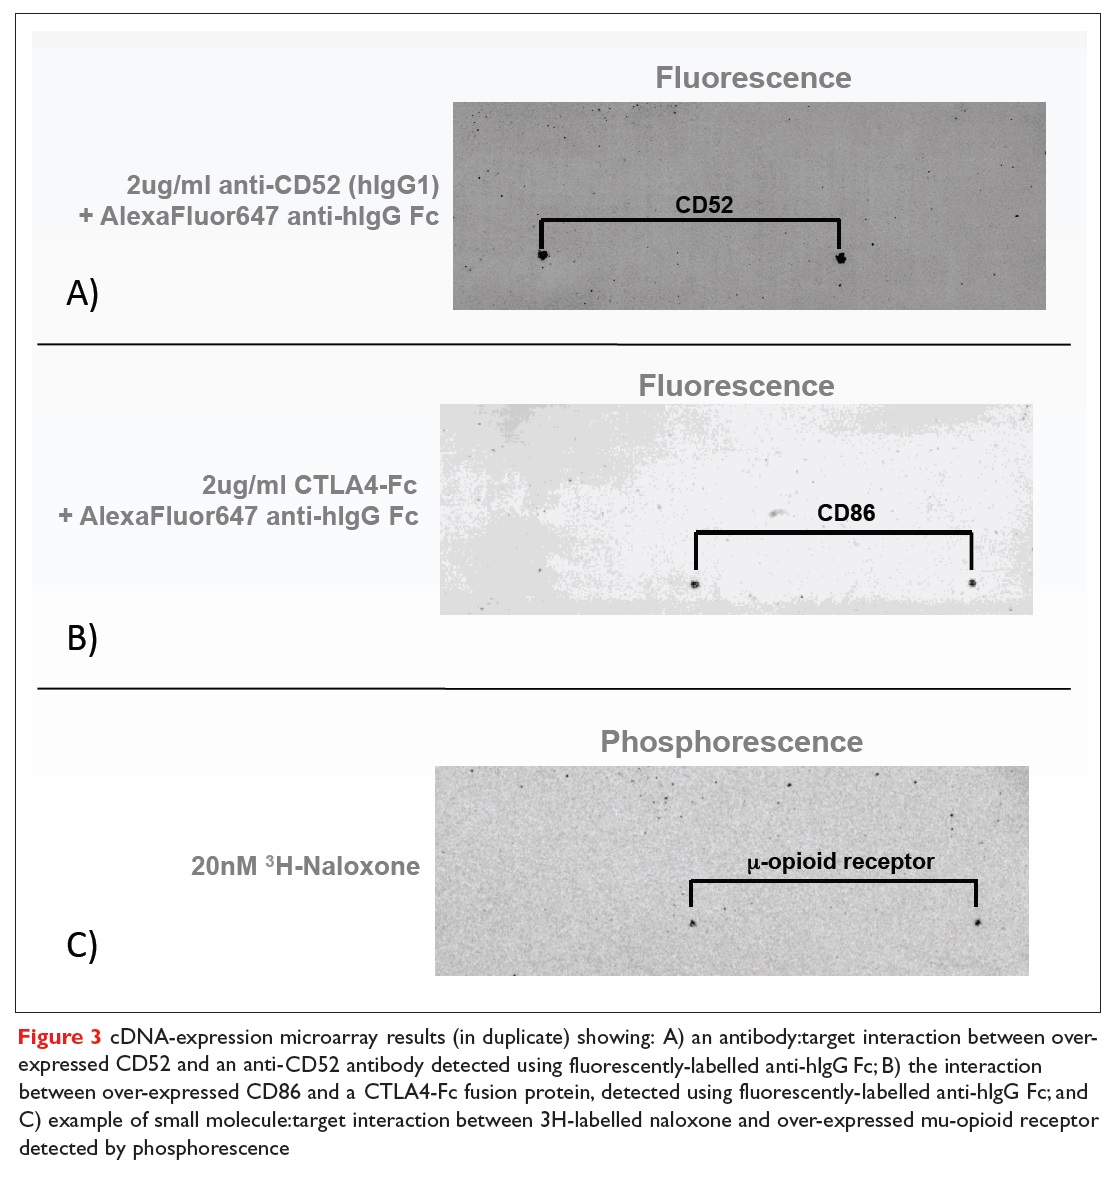 Figure 3 cDNA-expression microarray results